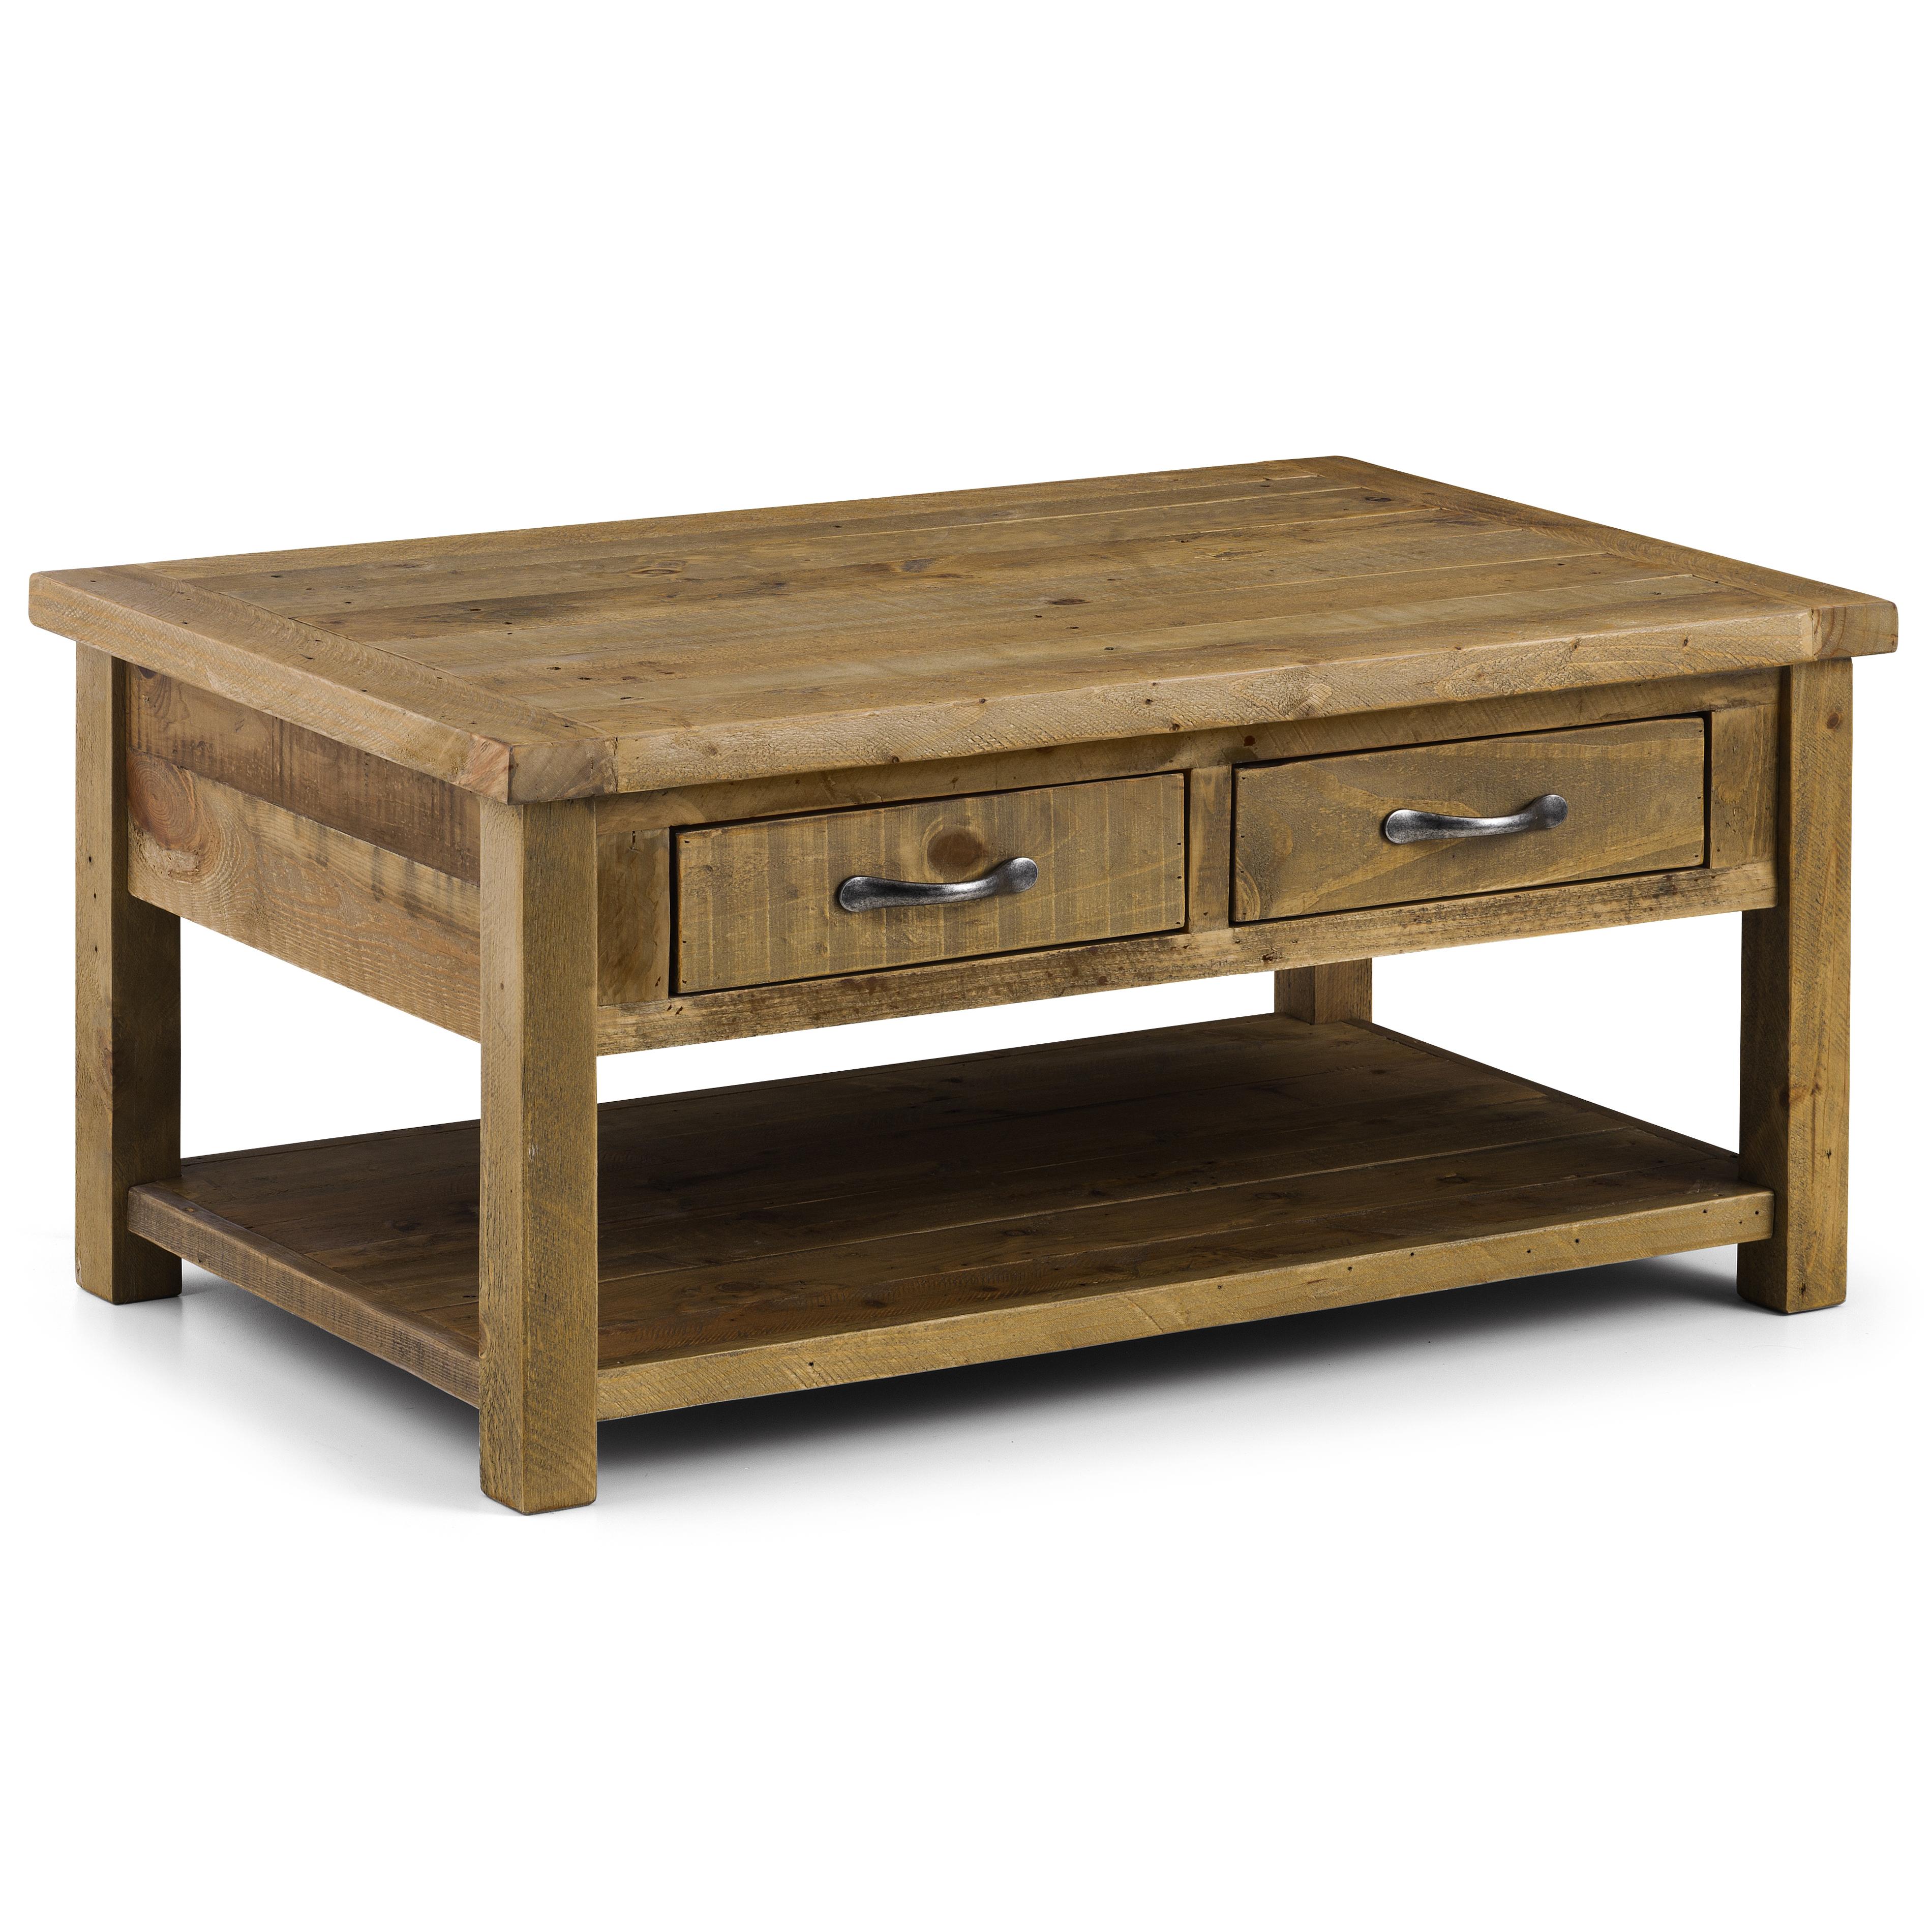 Julian Bowen Astoria Coffee Table With 2 Drawers